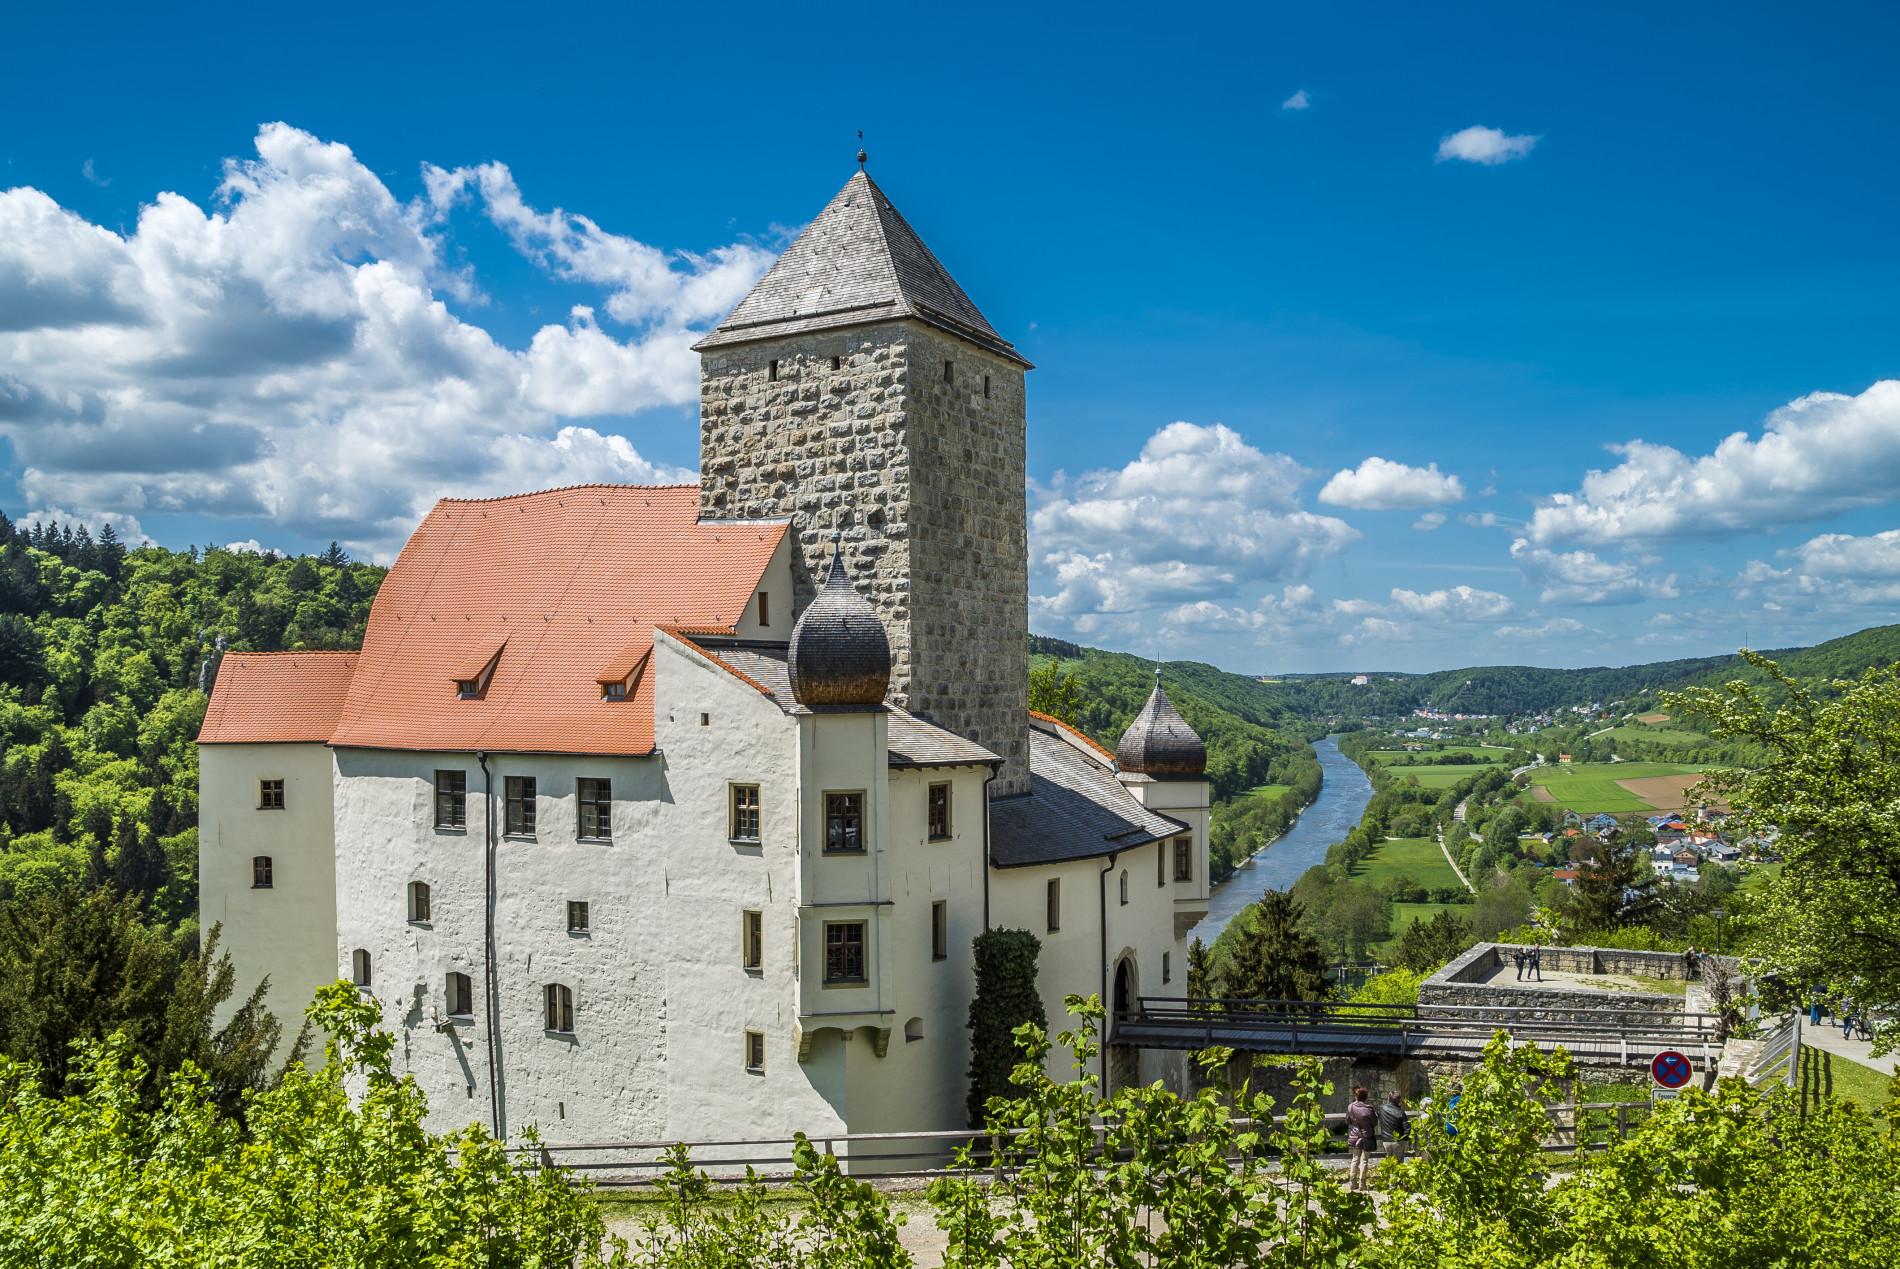 Riedenburg Burg Prunn